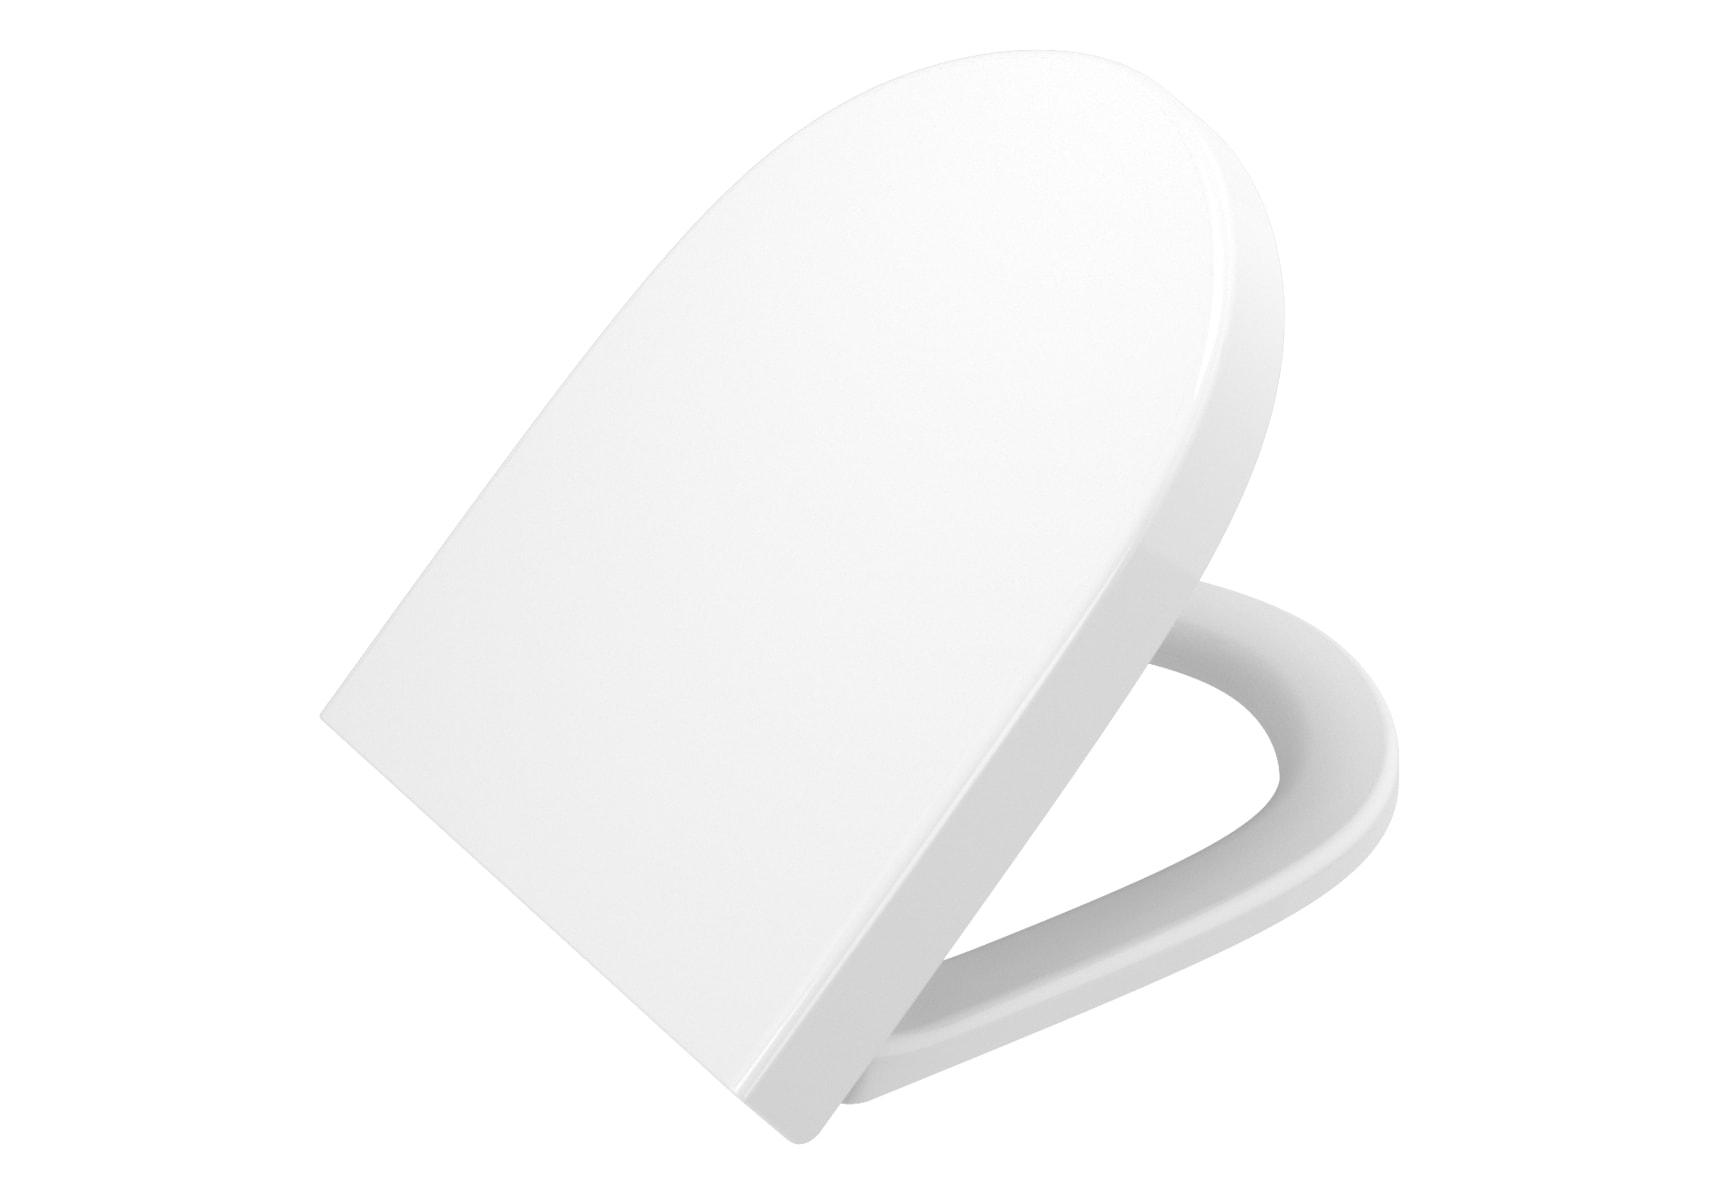 Sento/Bella WC Seat, Soft Closing, Quick Release